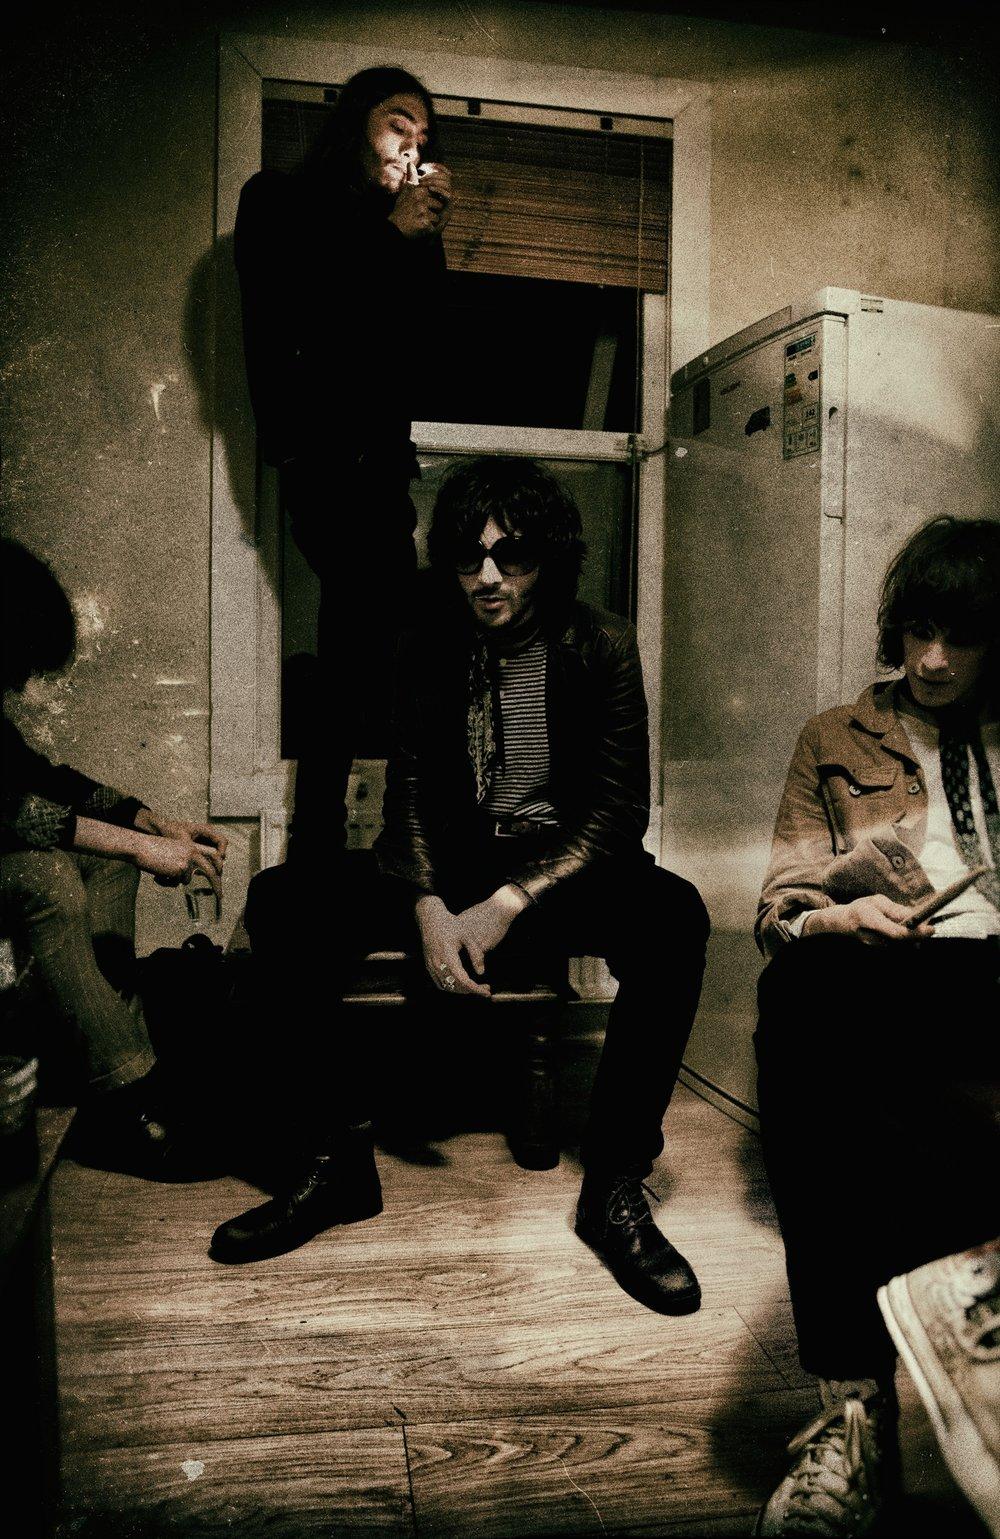 HC+@+Ox+Bullingdon+Colour+Band+Portrait+Grainy+&+F+18.4.16++copy.JPG